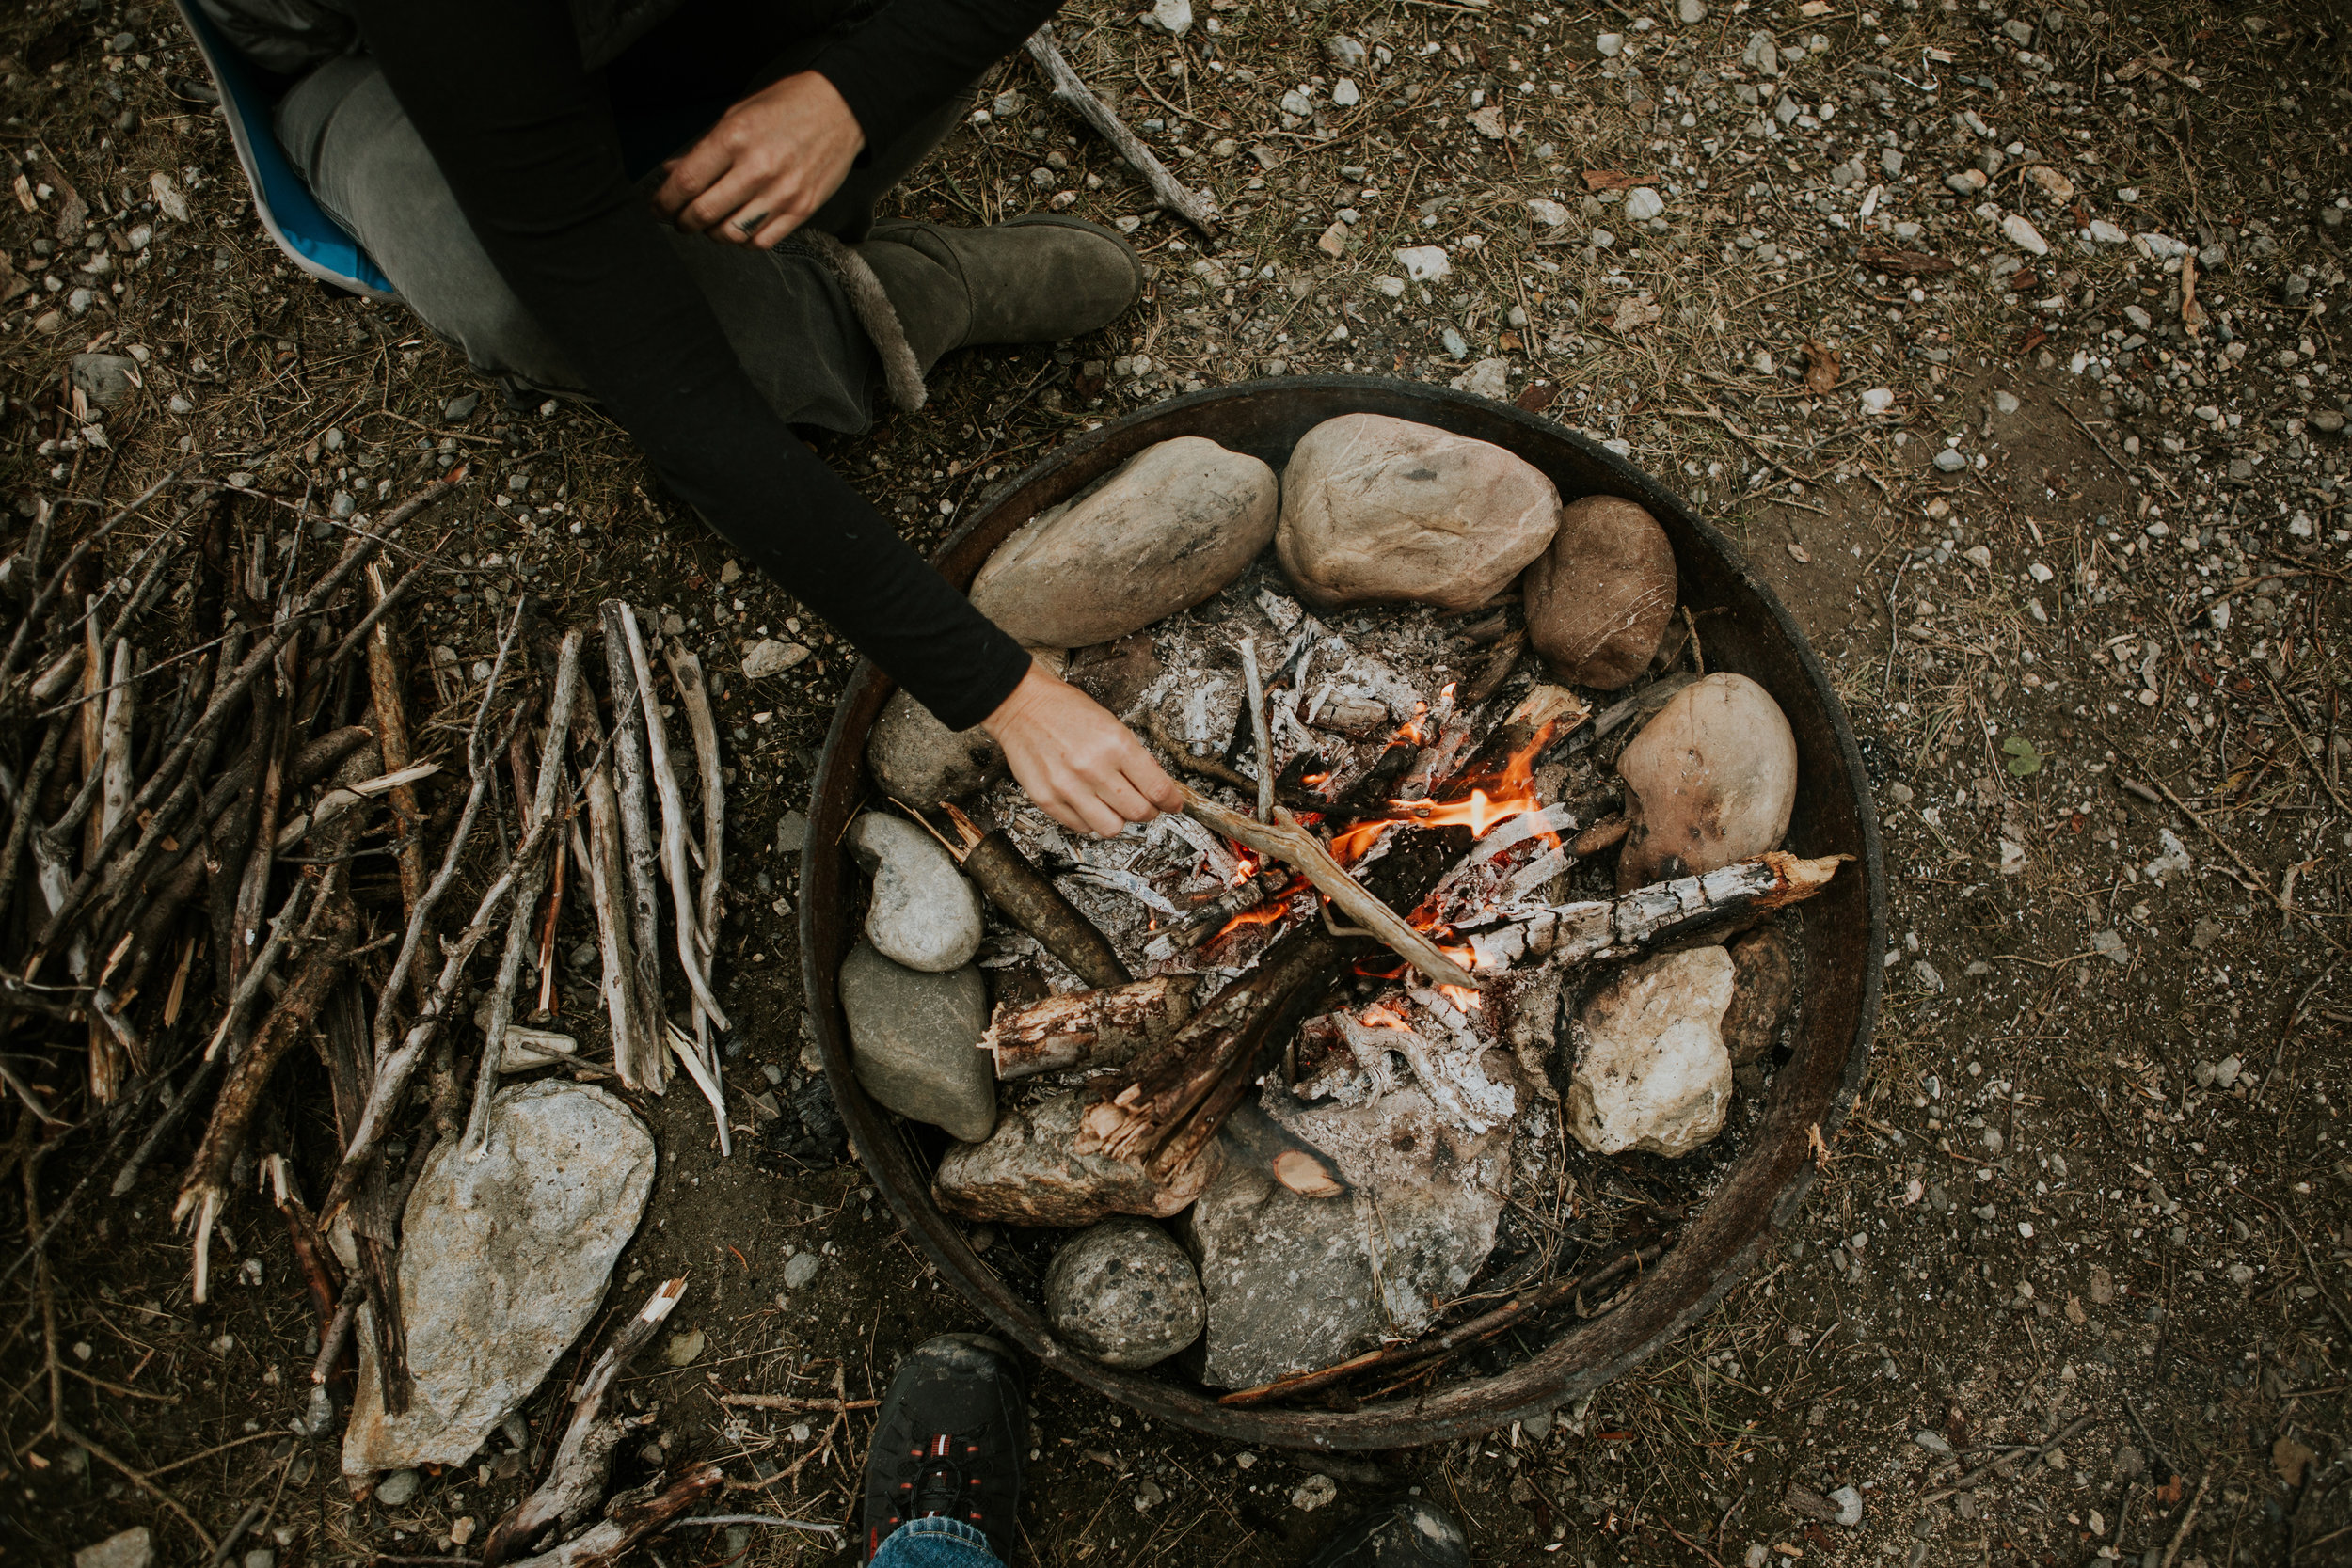 CindyGiovagnoli_Alaska_KoyukukRiver_SukakpakMountain_JimRiver_ArcticCircle_fly_fishing_September-014.jpg